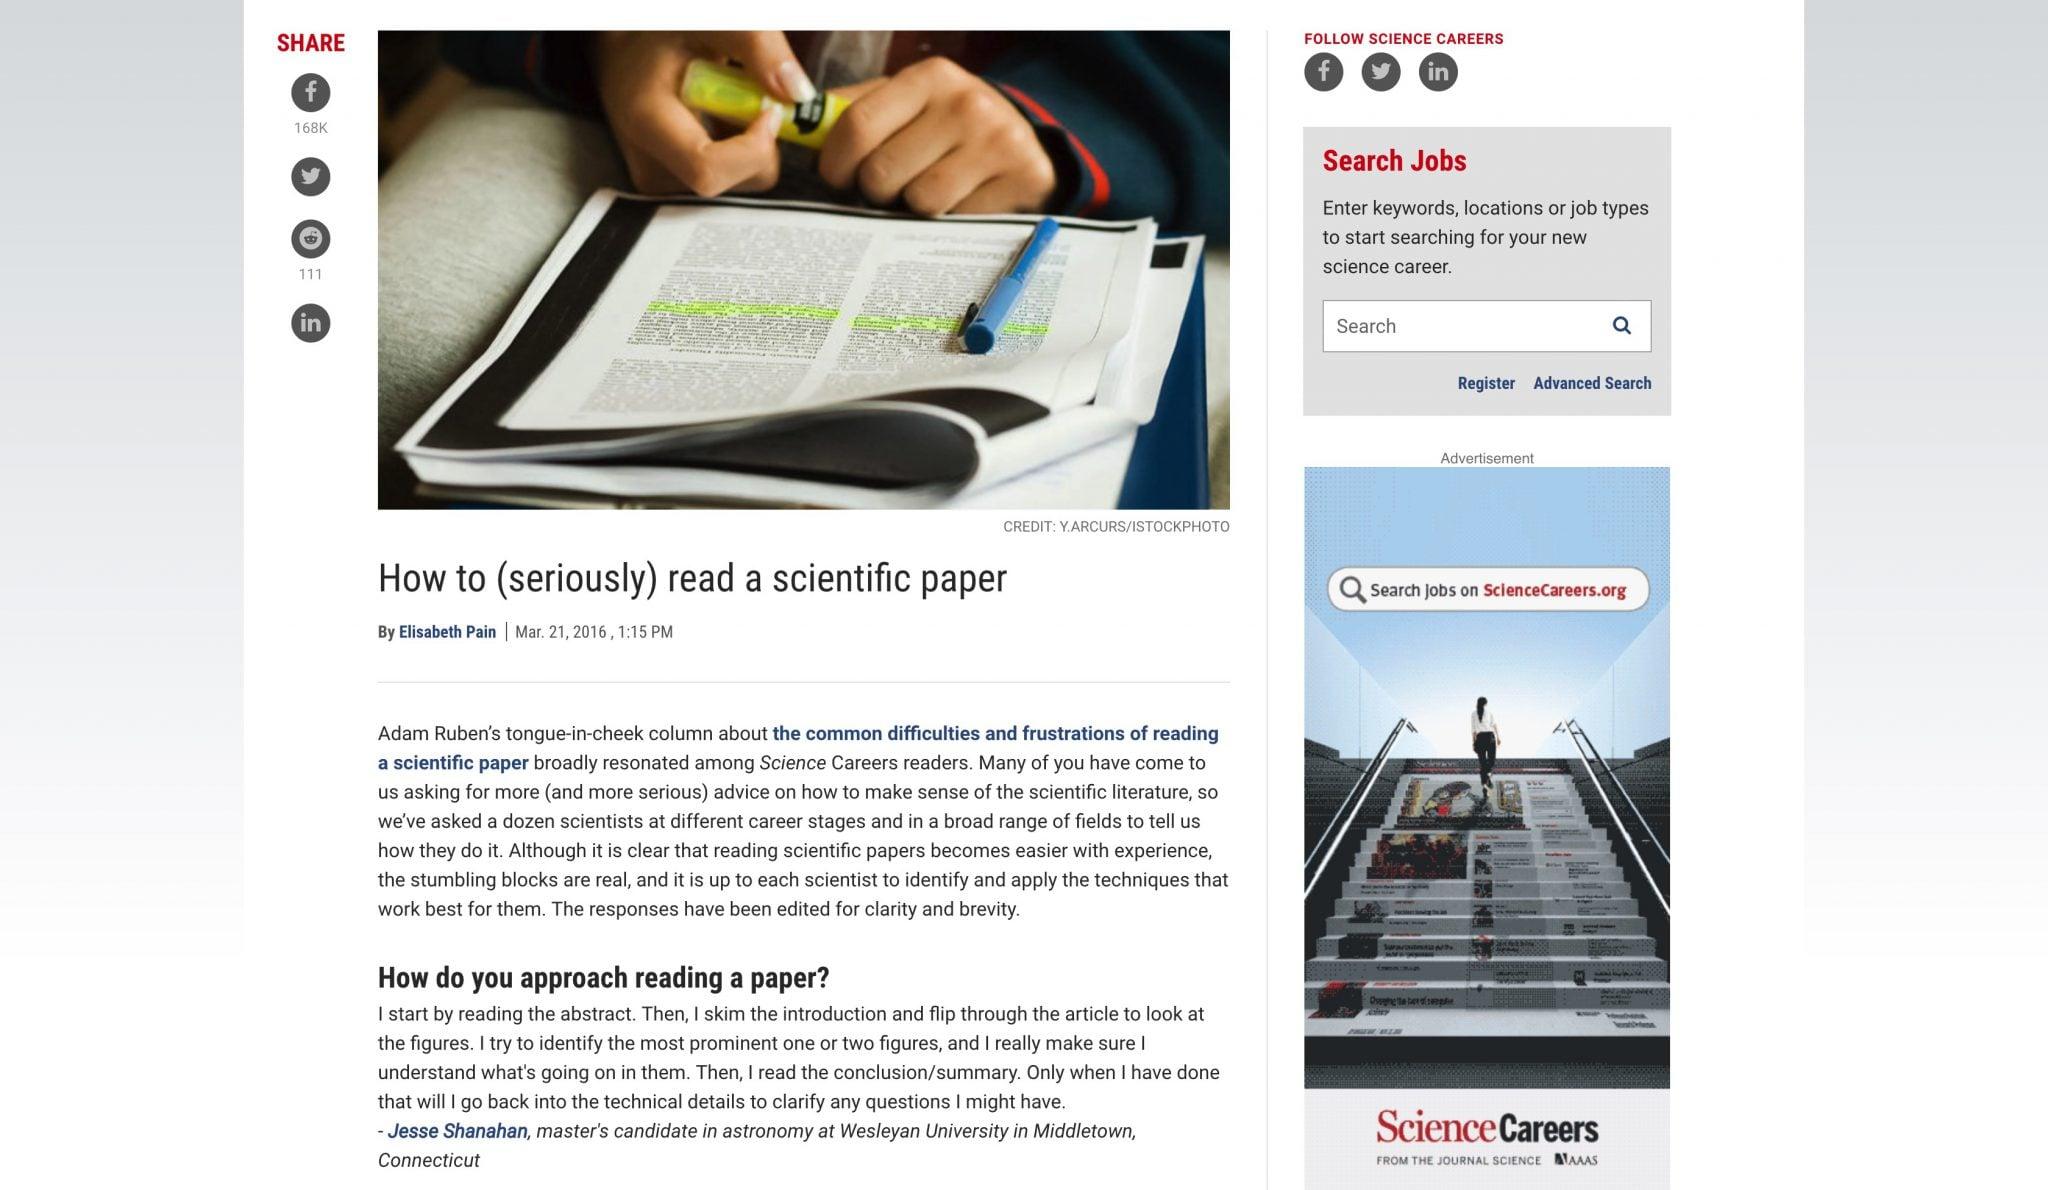 Science Articel Read a scientific paper 20180301 將喜歡的文章「寄」給亞馬遜 Amazon Kindle 電子閱讀器的使用教學